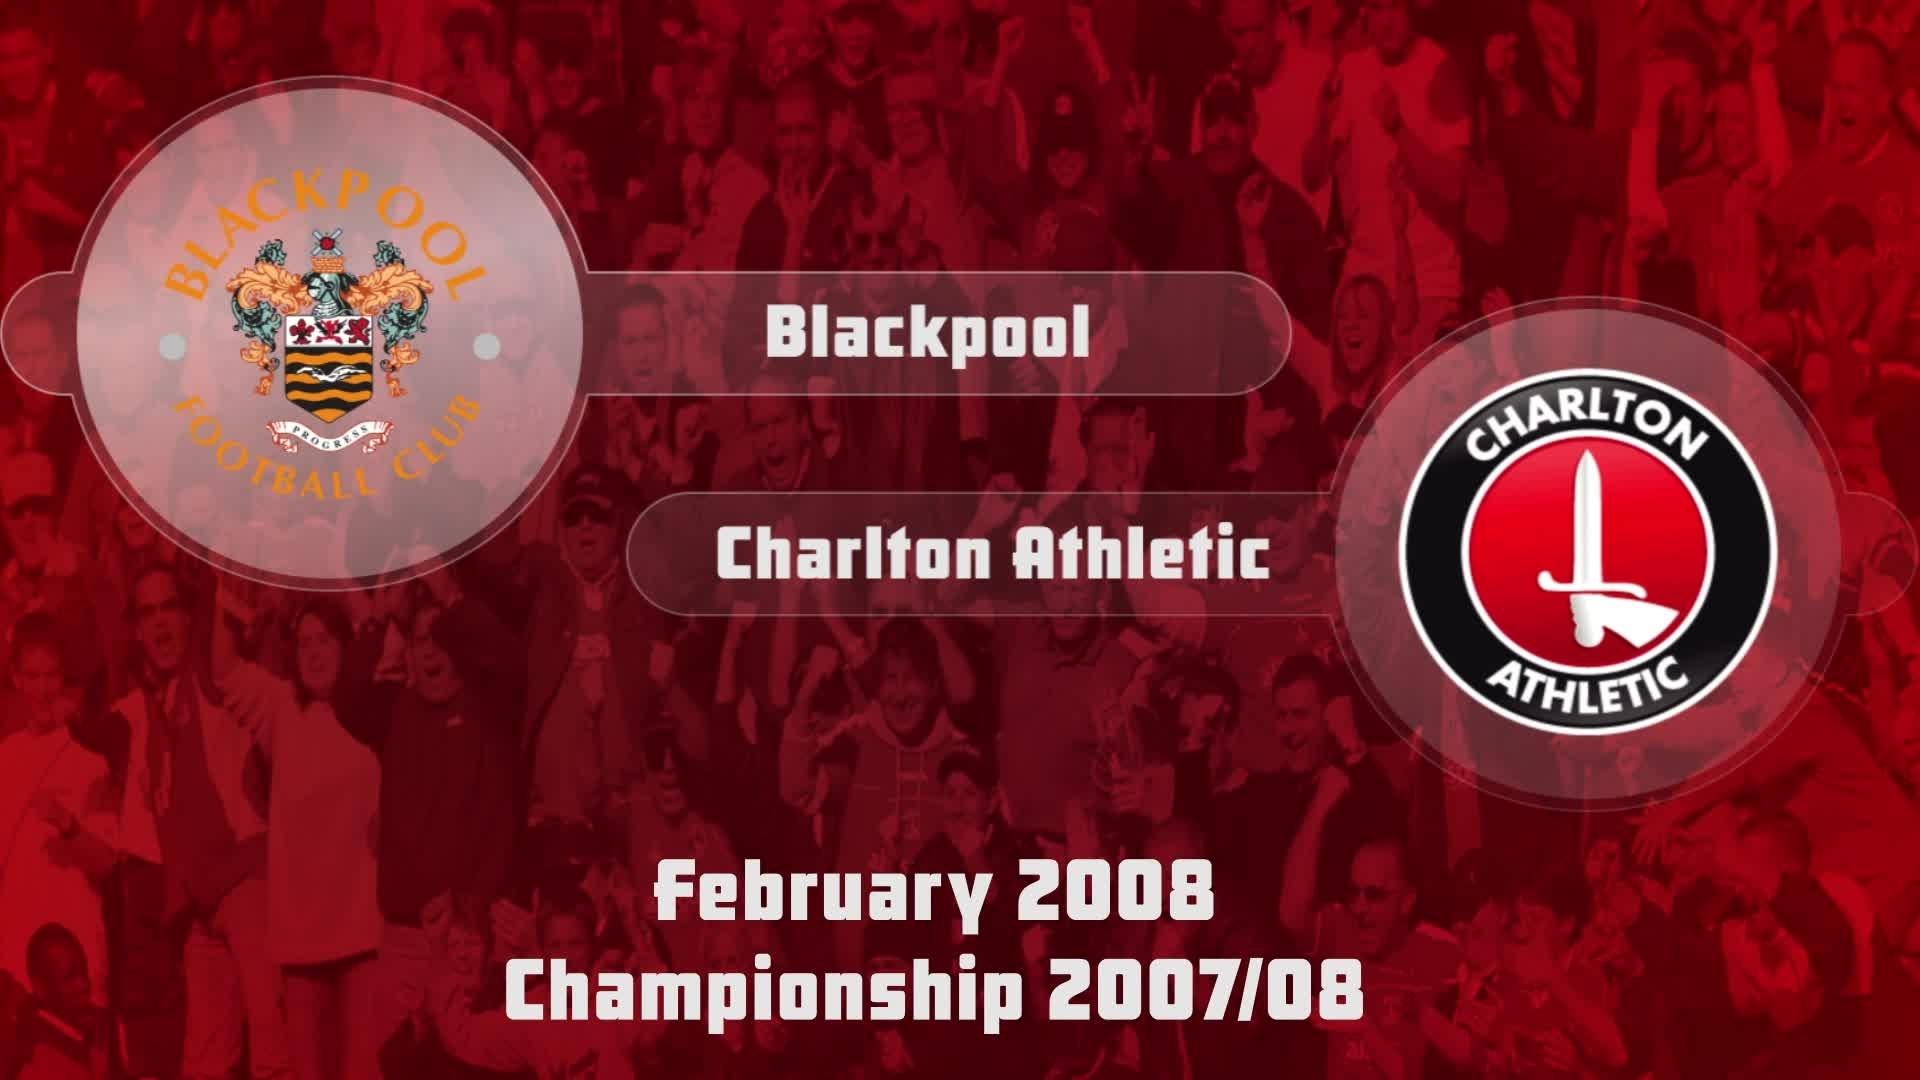 39 HIGHLIGHTS | Blackpool 5 Charlton 3 (Feb 2008)